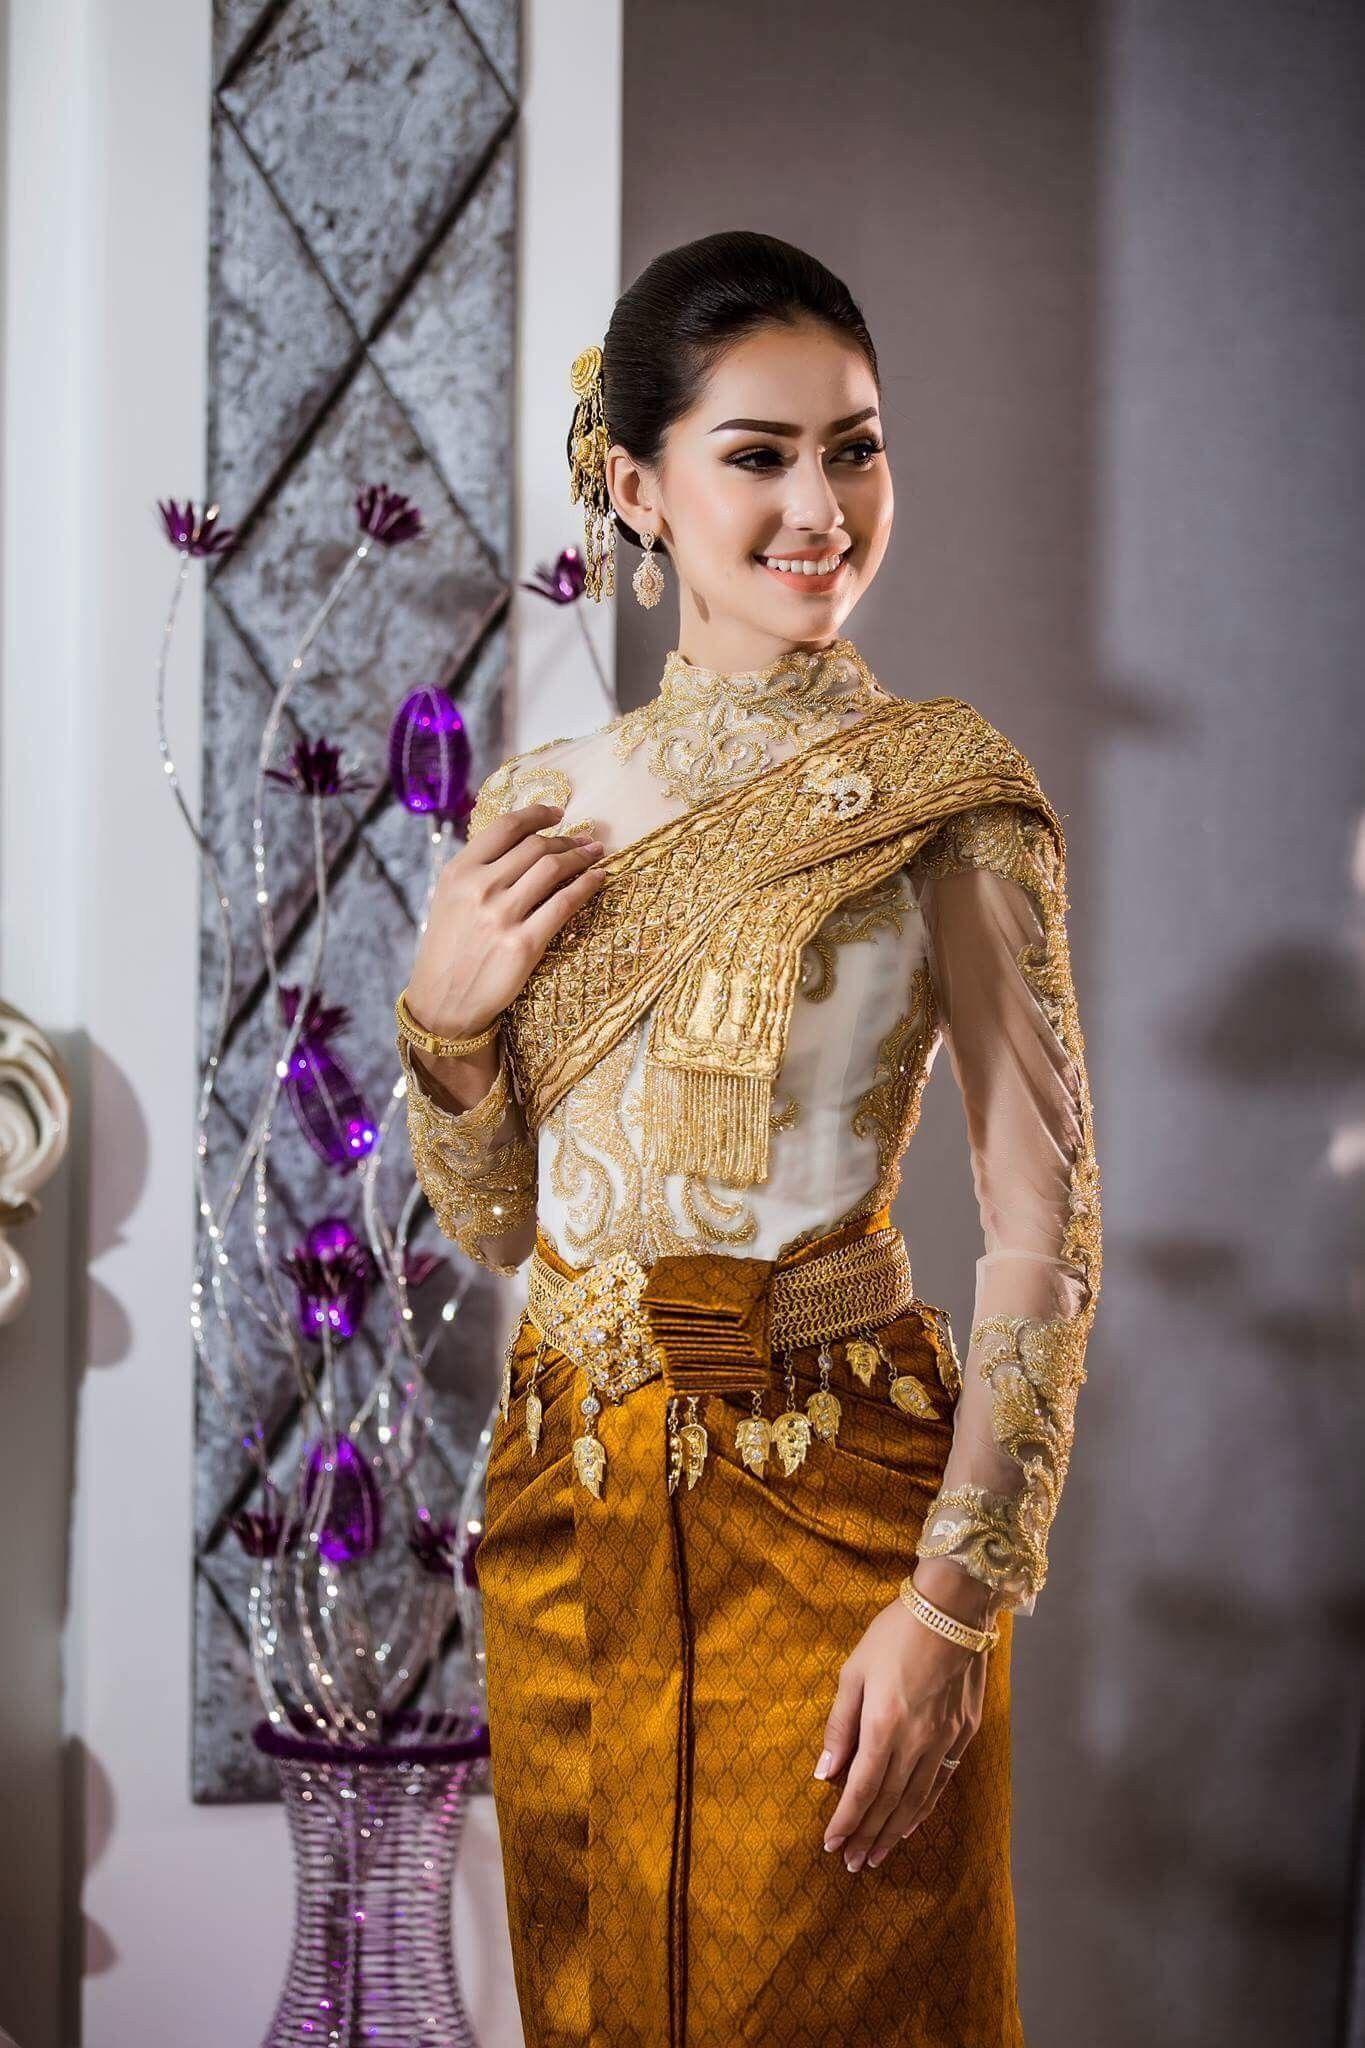 Pin by monirath pich on khemara in pinterest dresses